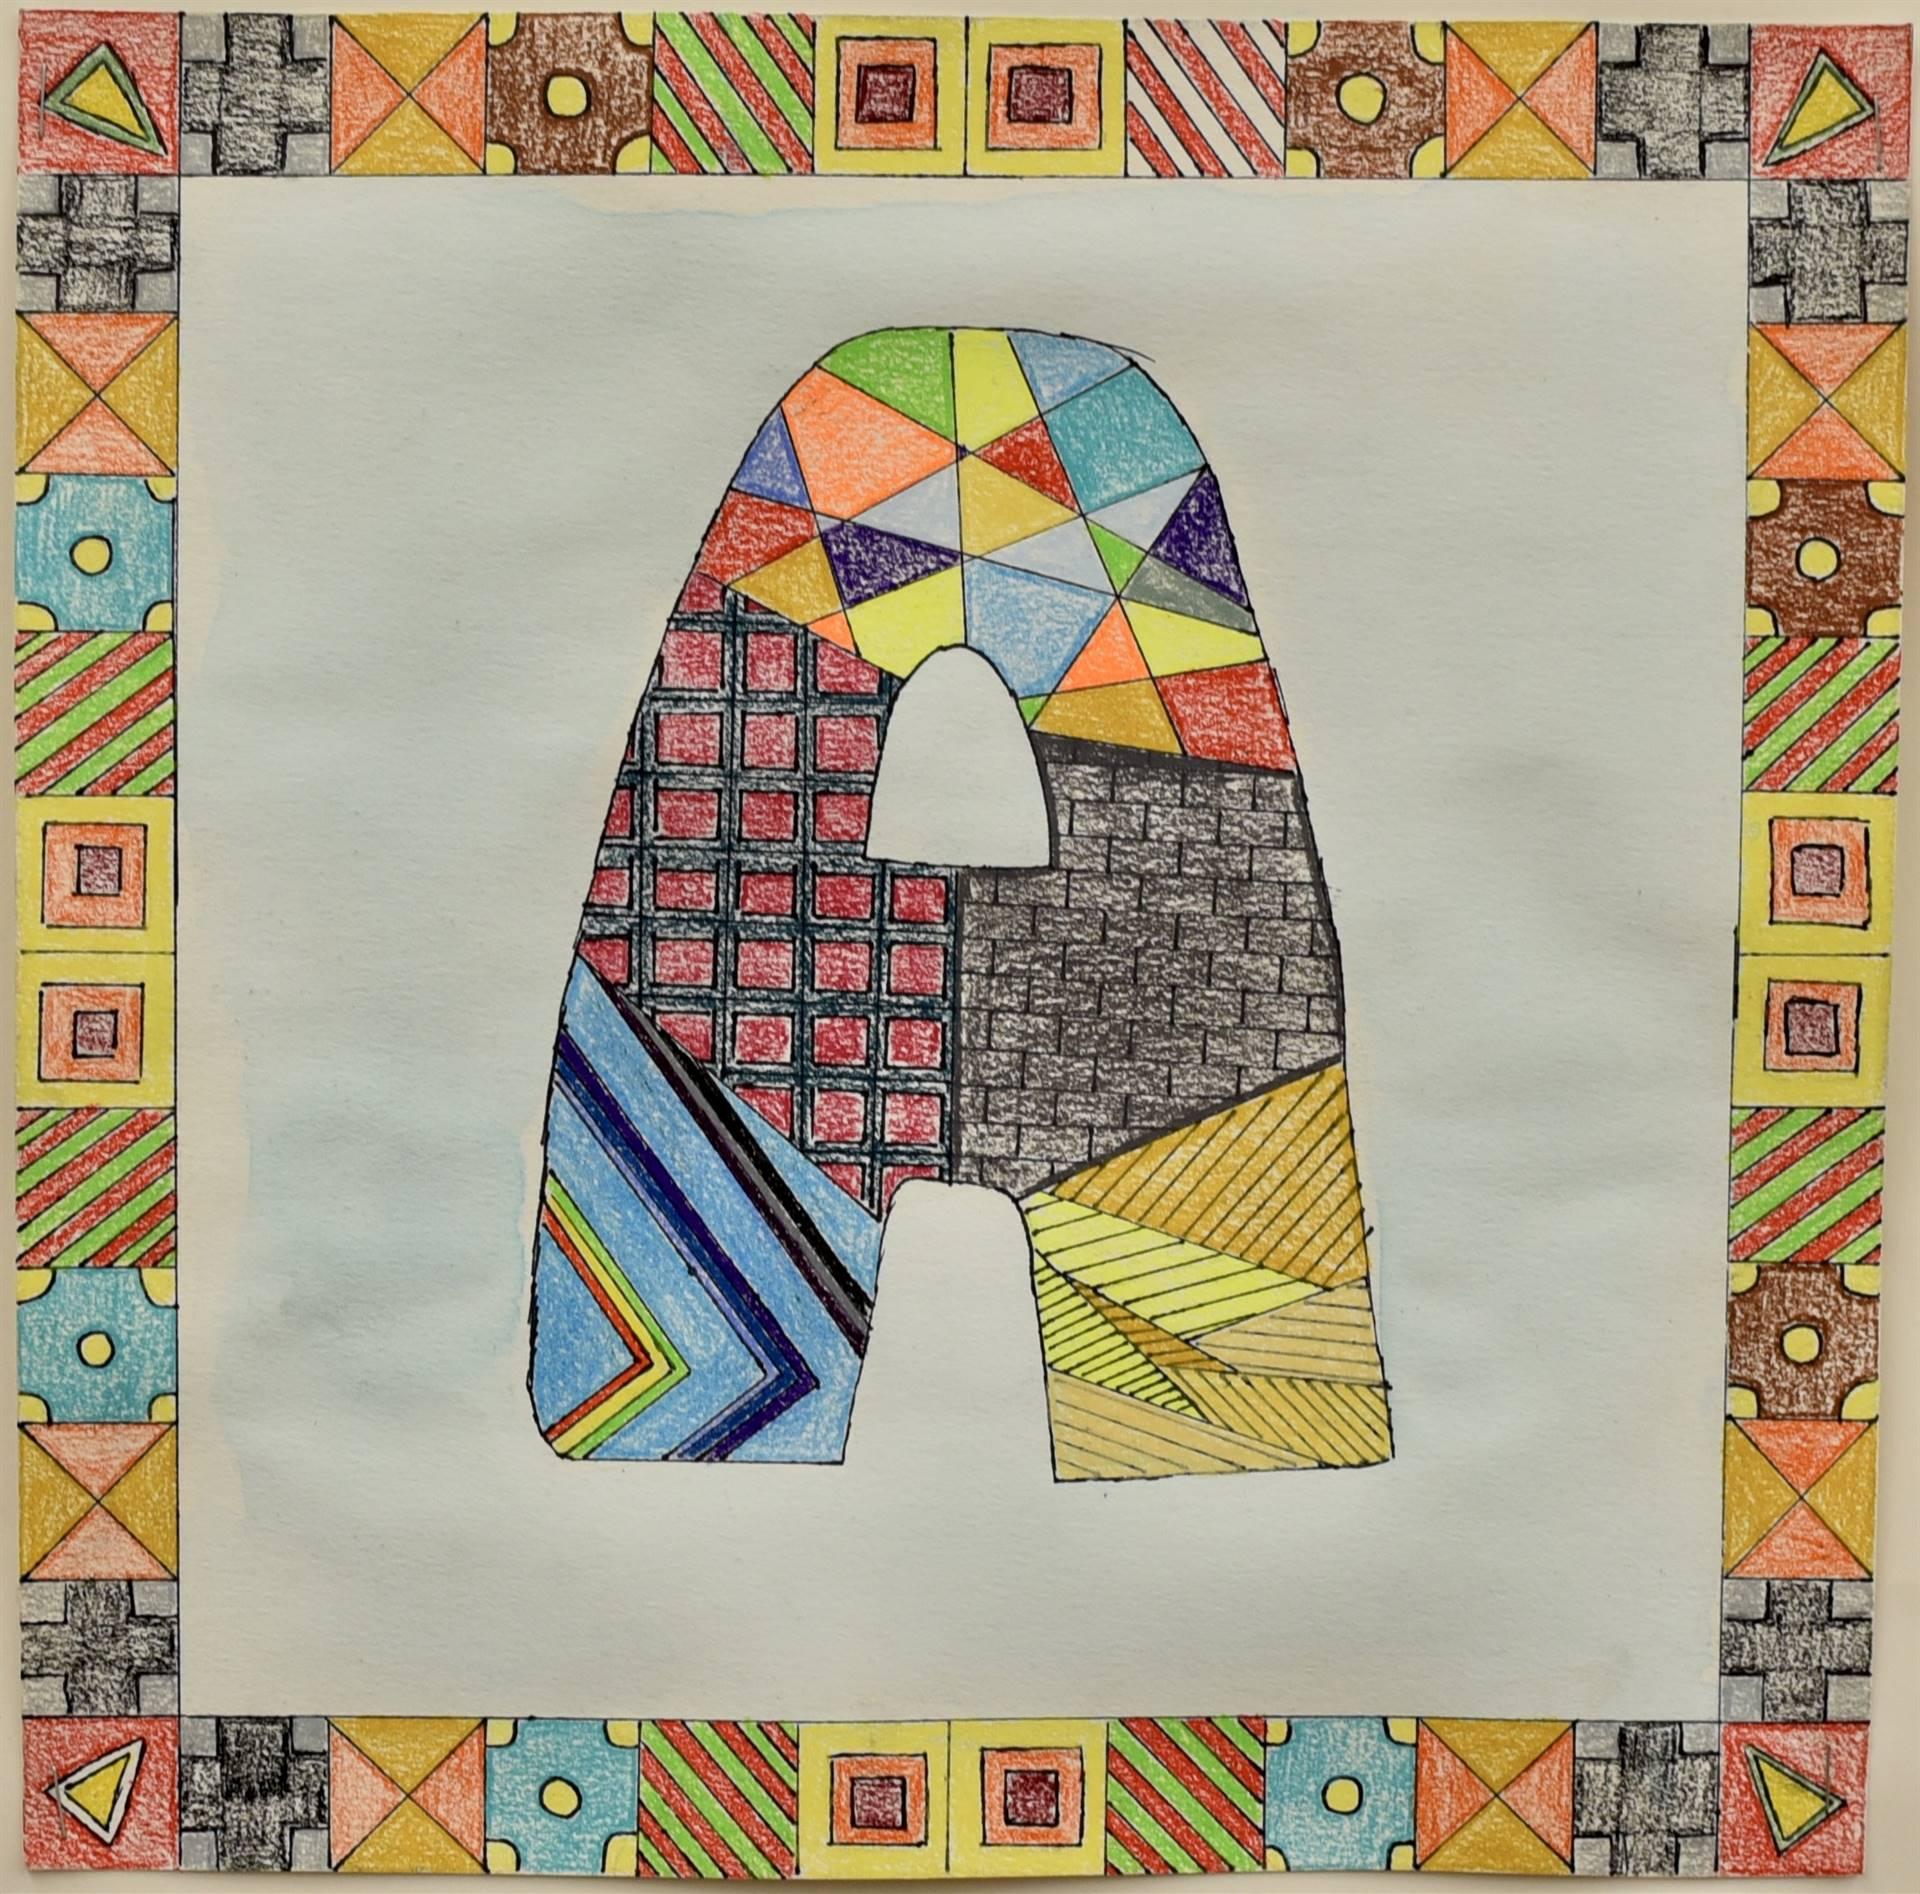 Brecksville-Broadview Hts. Middle School Art Projects 55